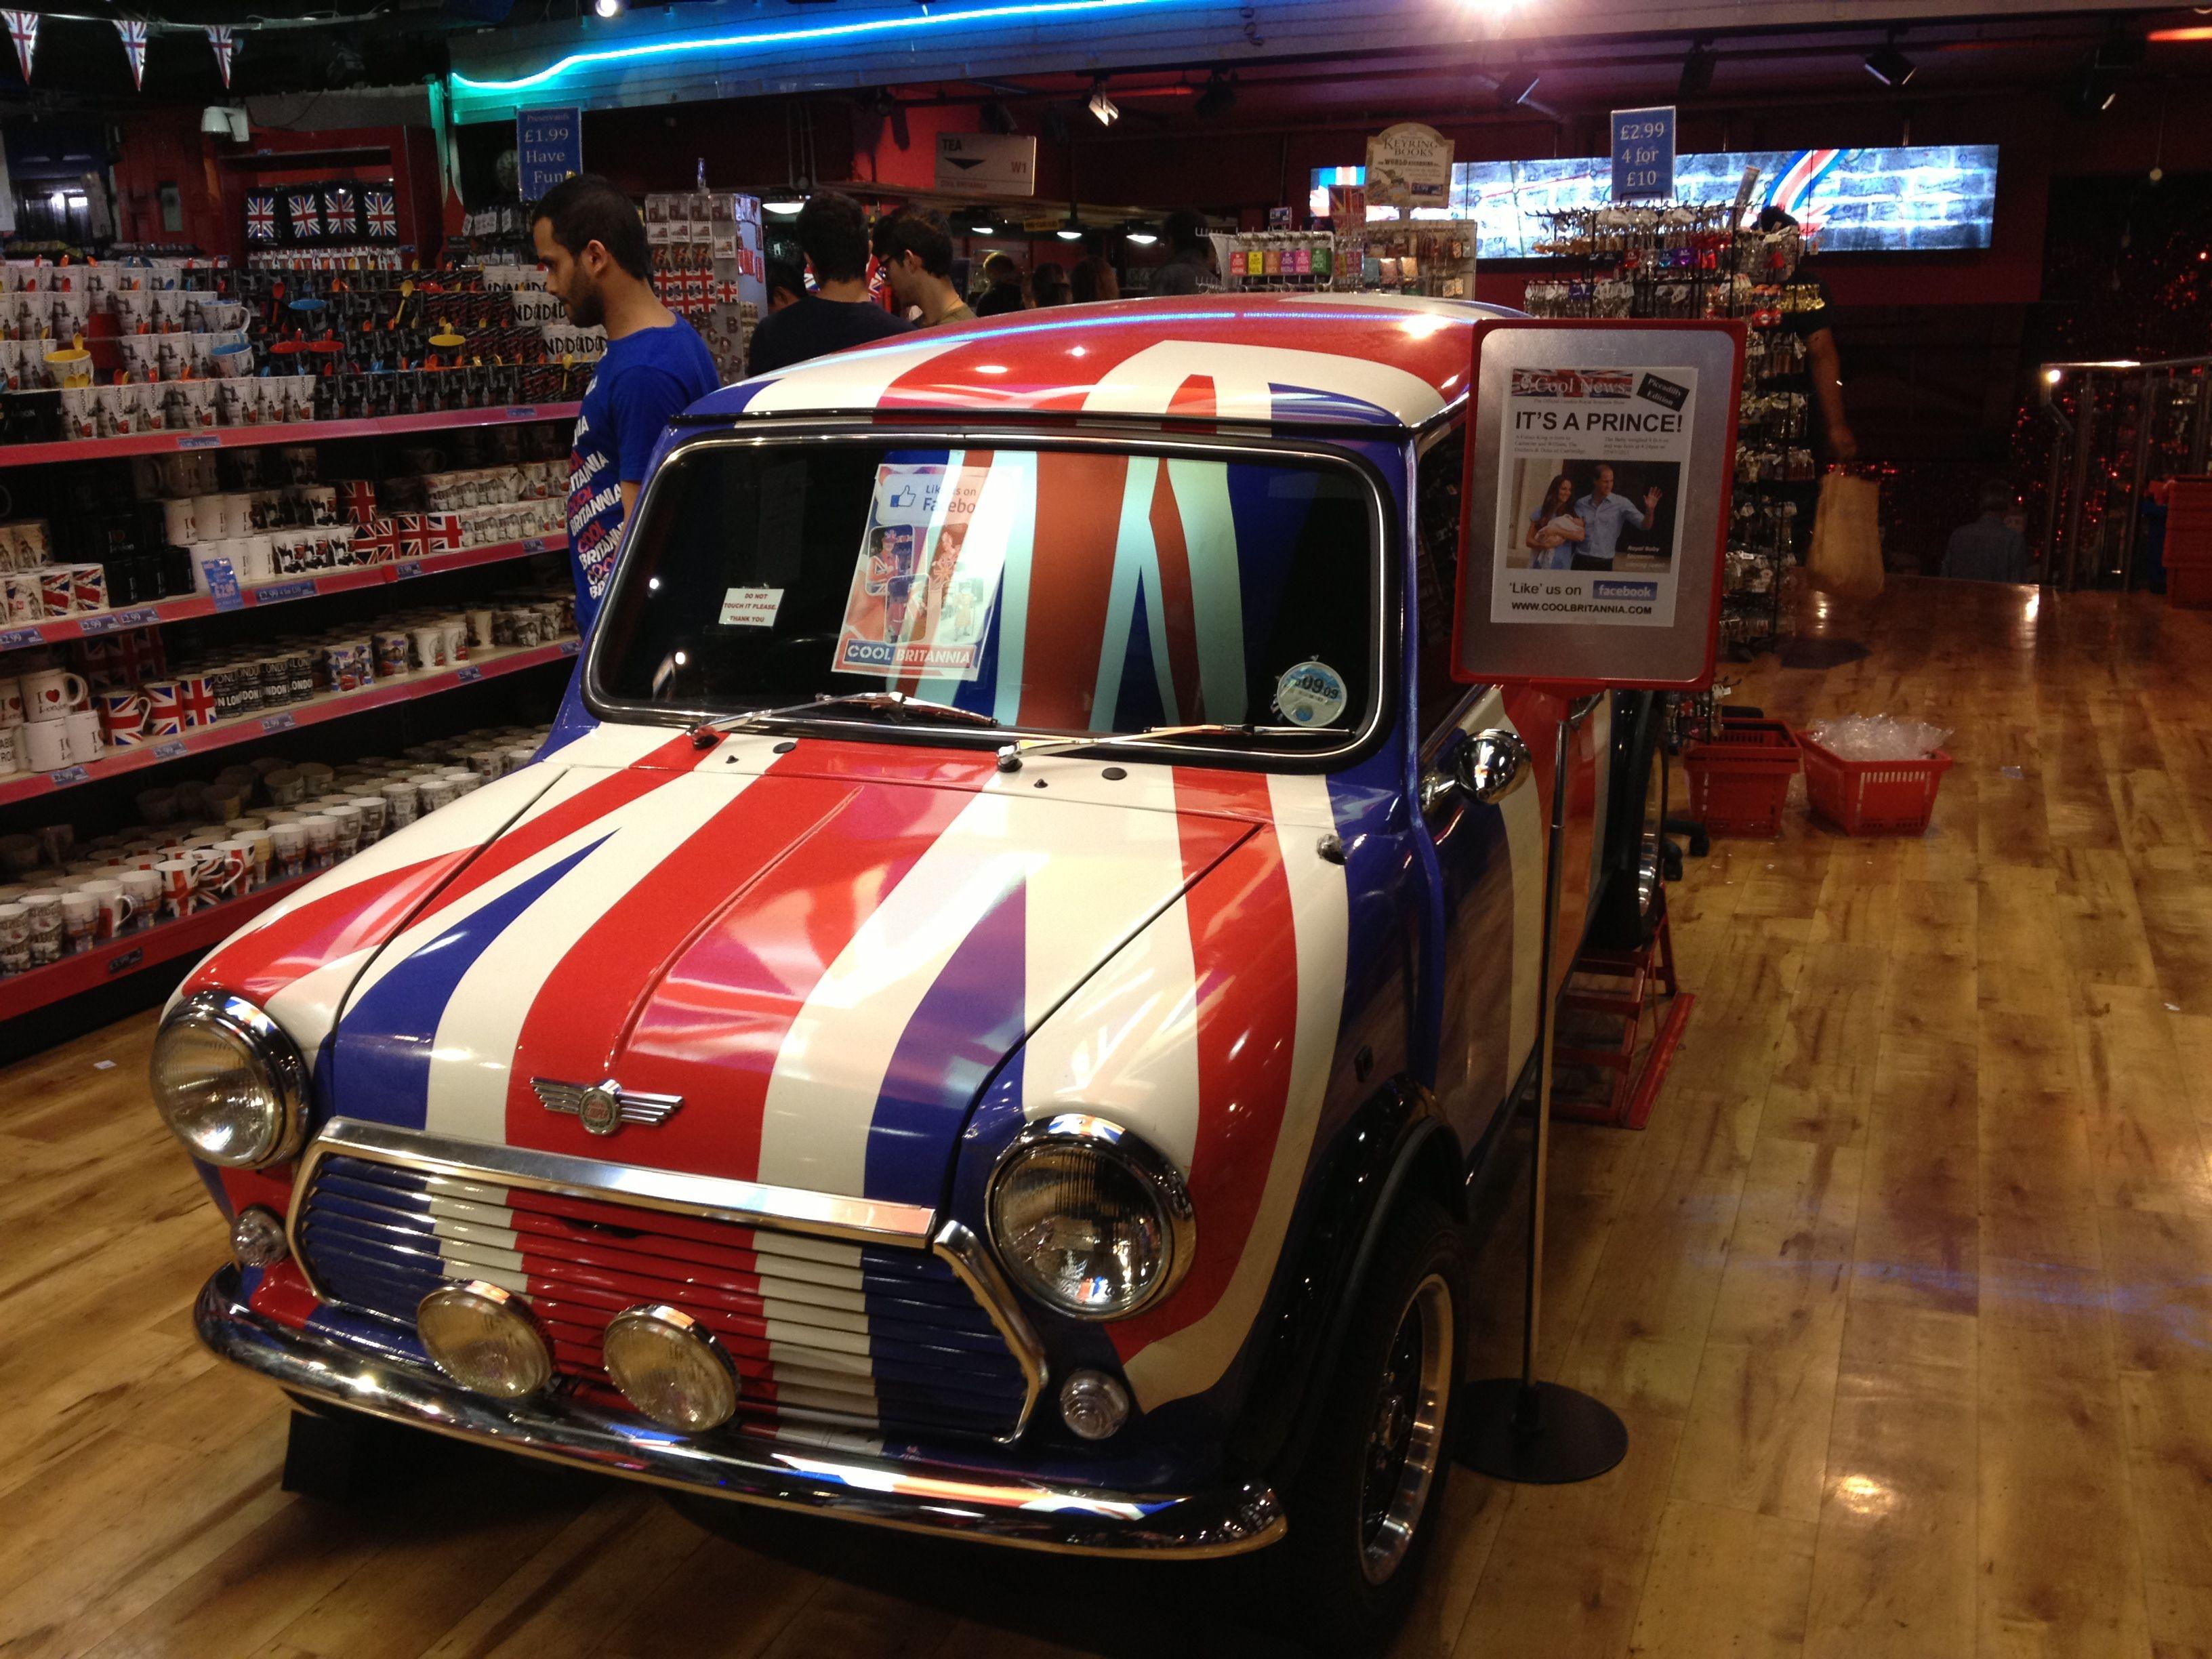 UK Flag Car London uk flag car Uk flag, London